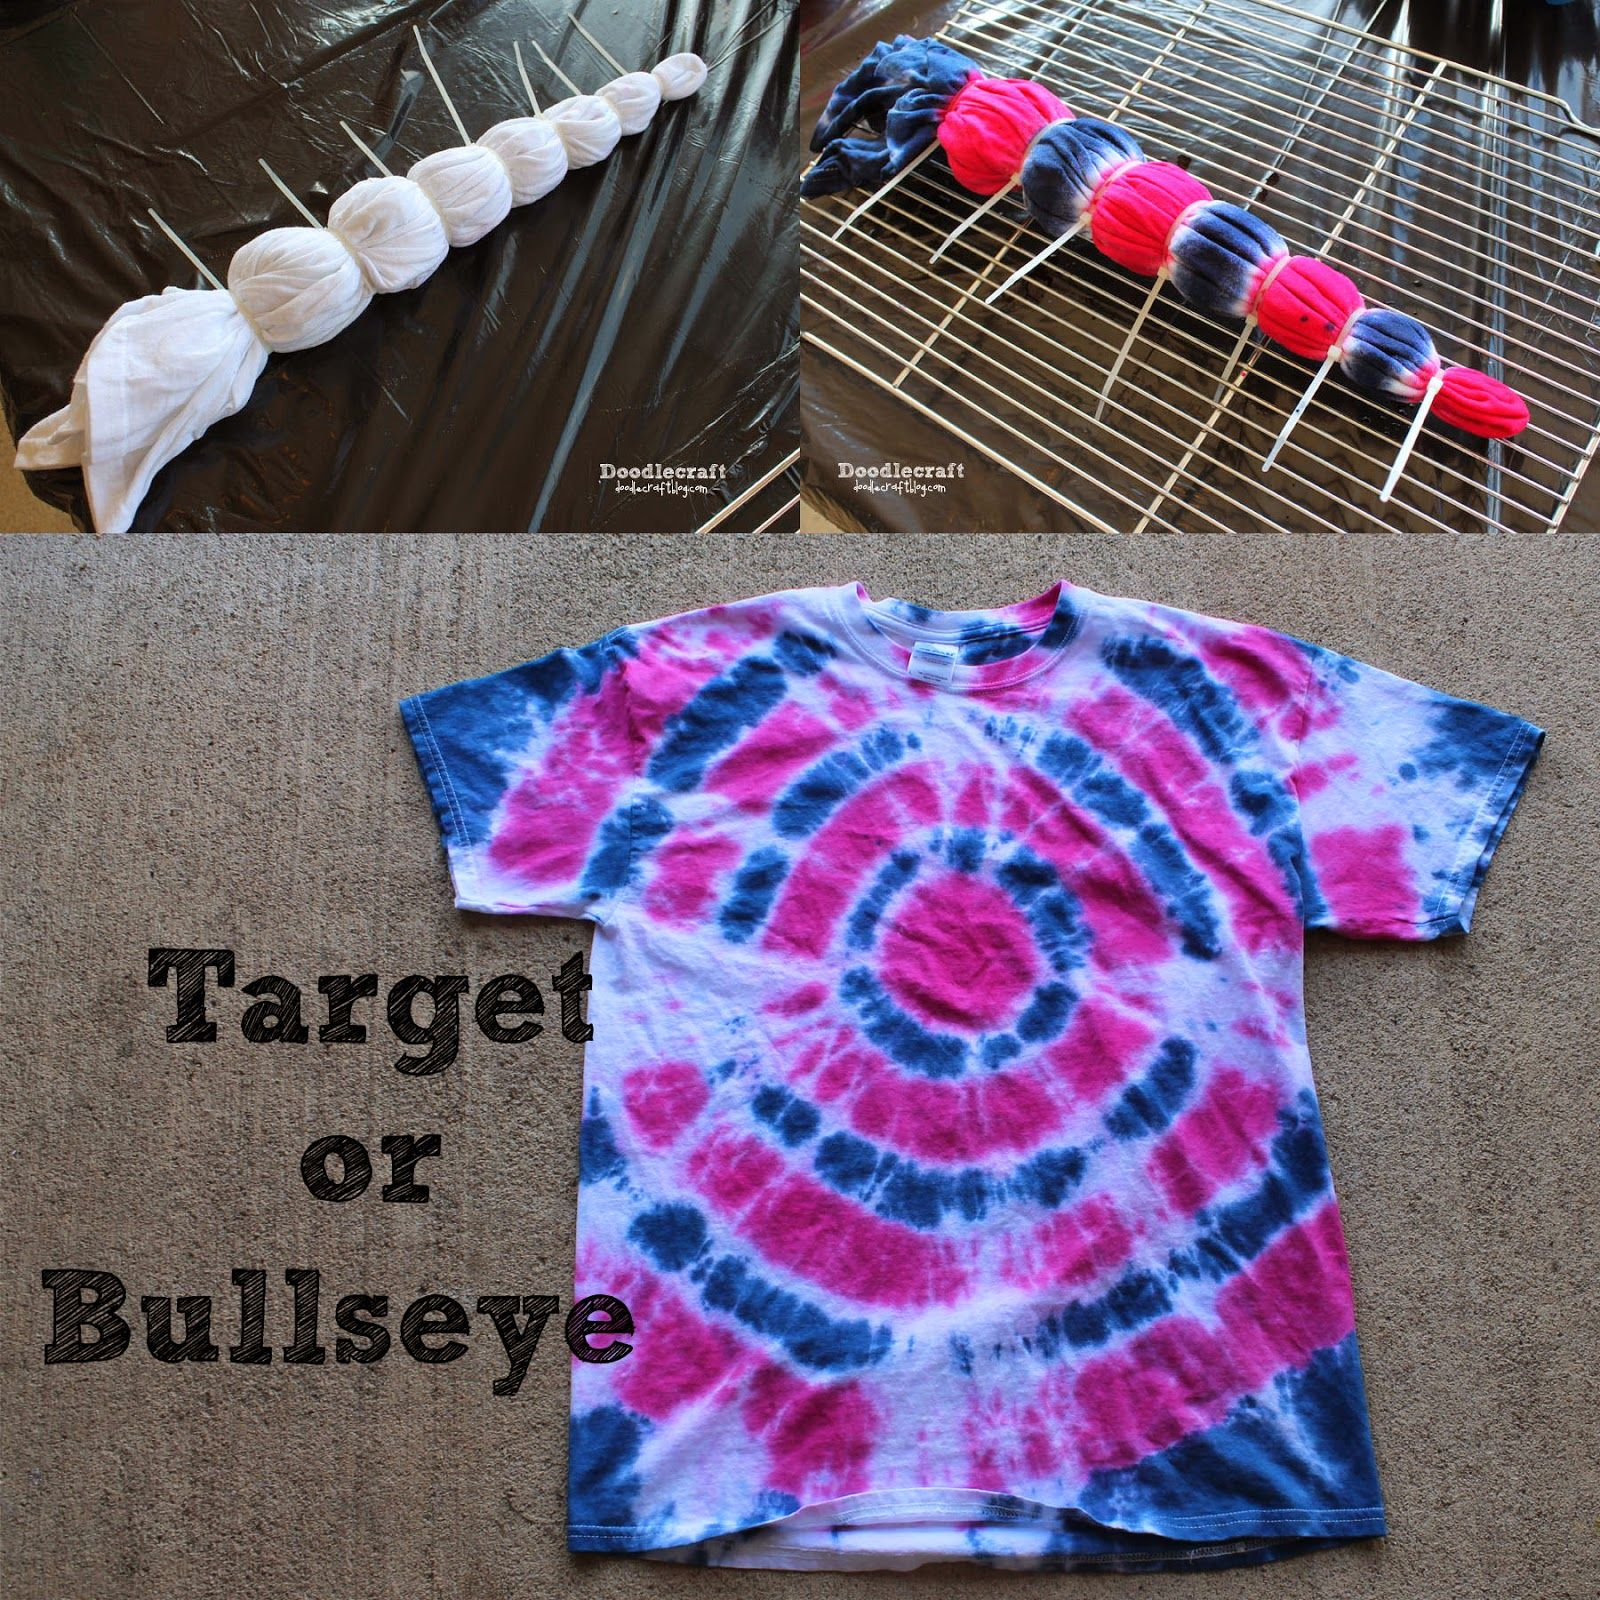 Tulip tie dye t shirt party captain america shirt capt america tulip tie dye t shirt party target or bulls eye pattern great baditri Gallery